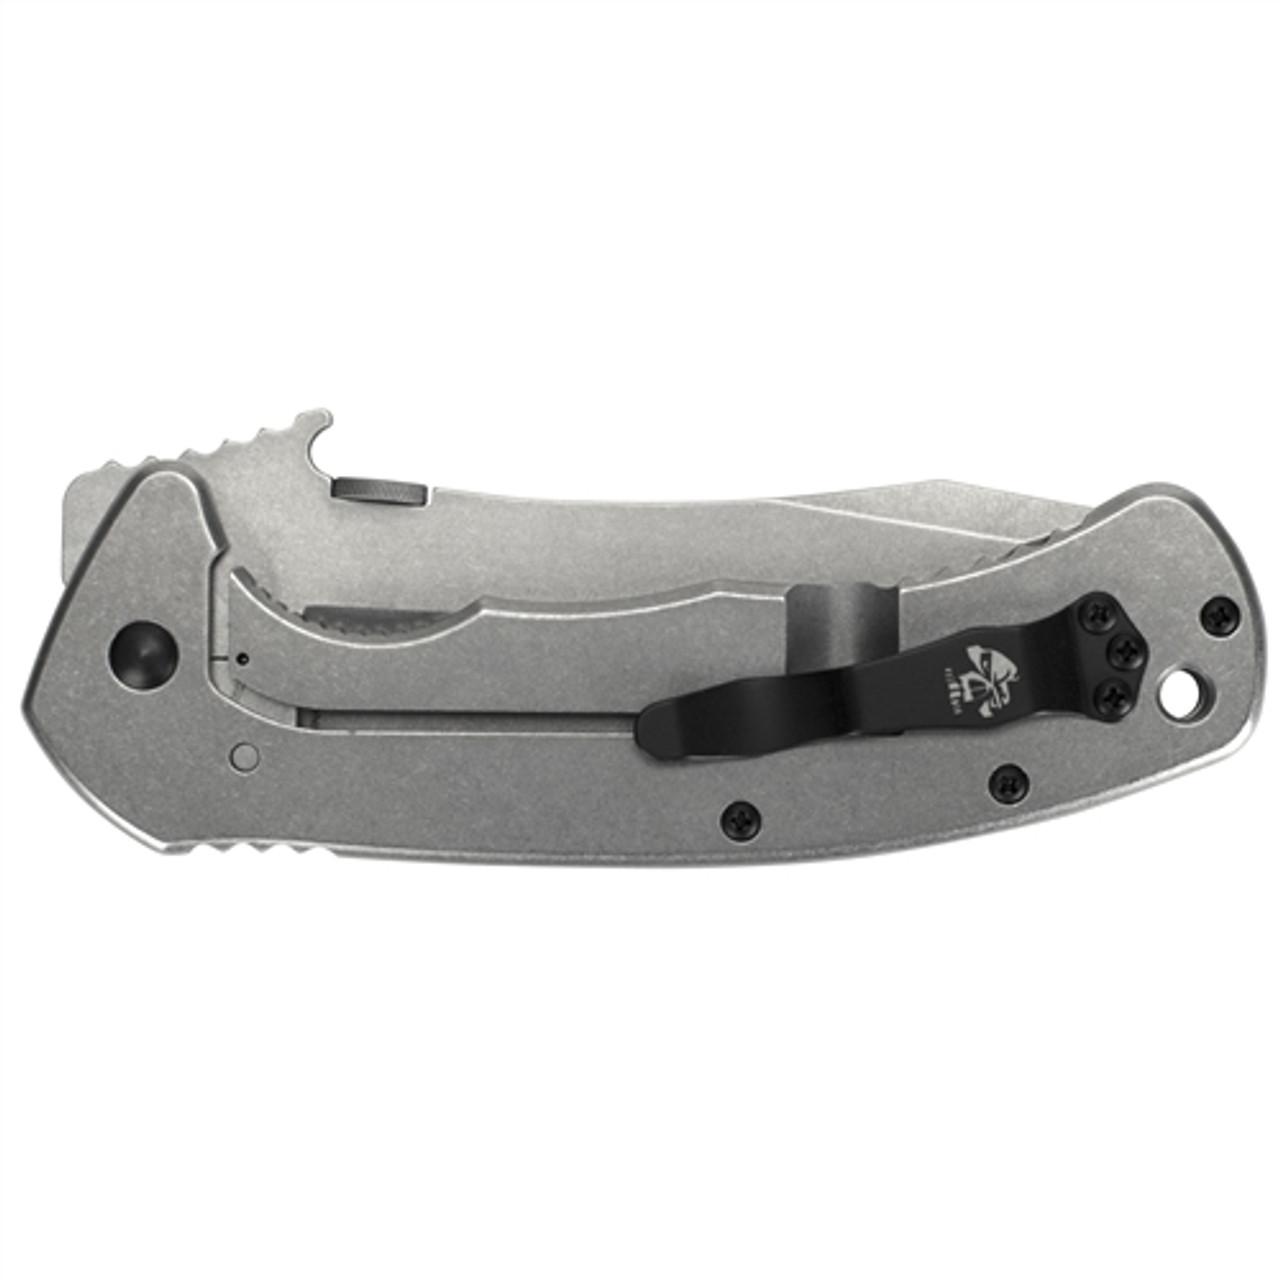 Kershaw 6031 Brown Emerson CQC-11K Folder Knife, Stonewash Blade